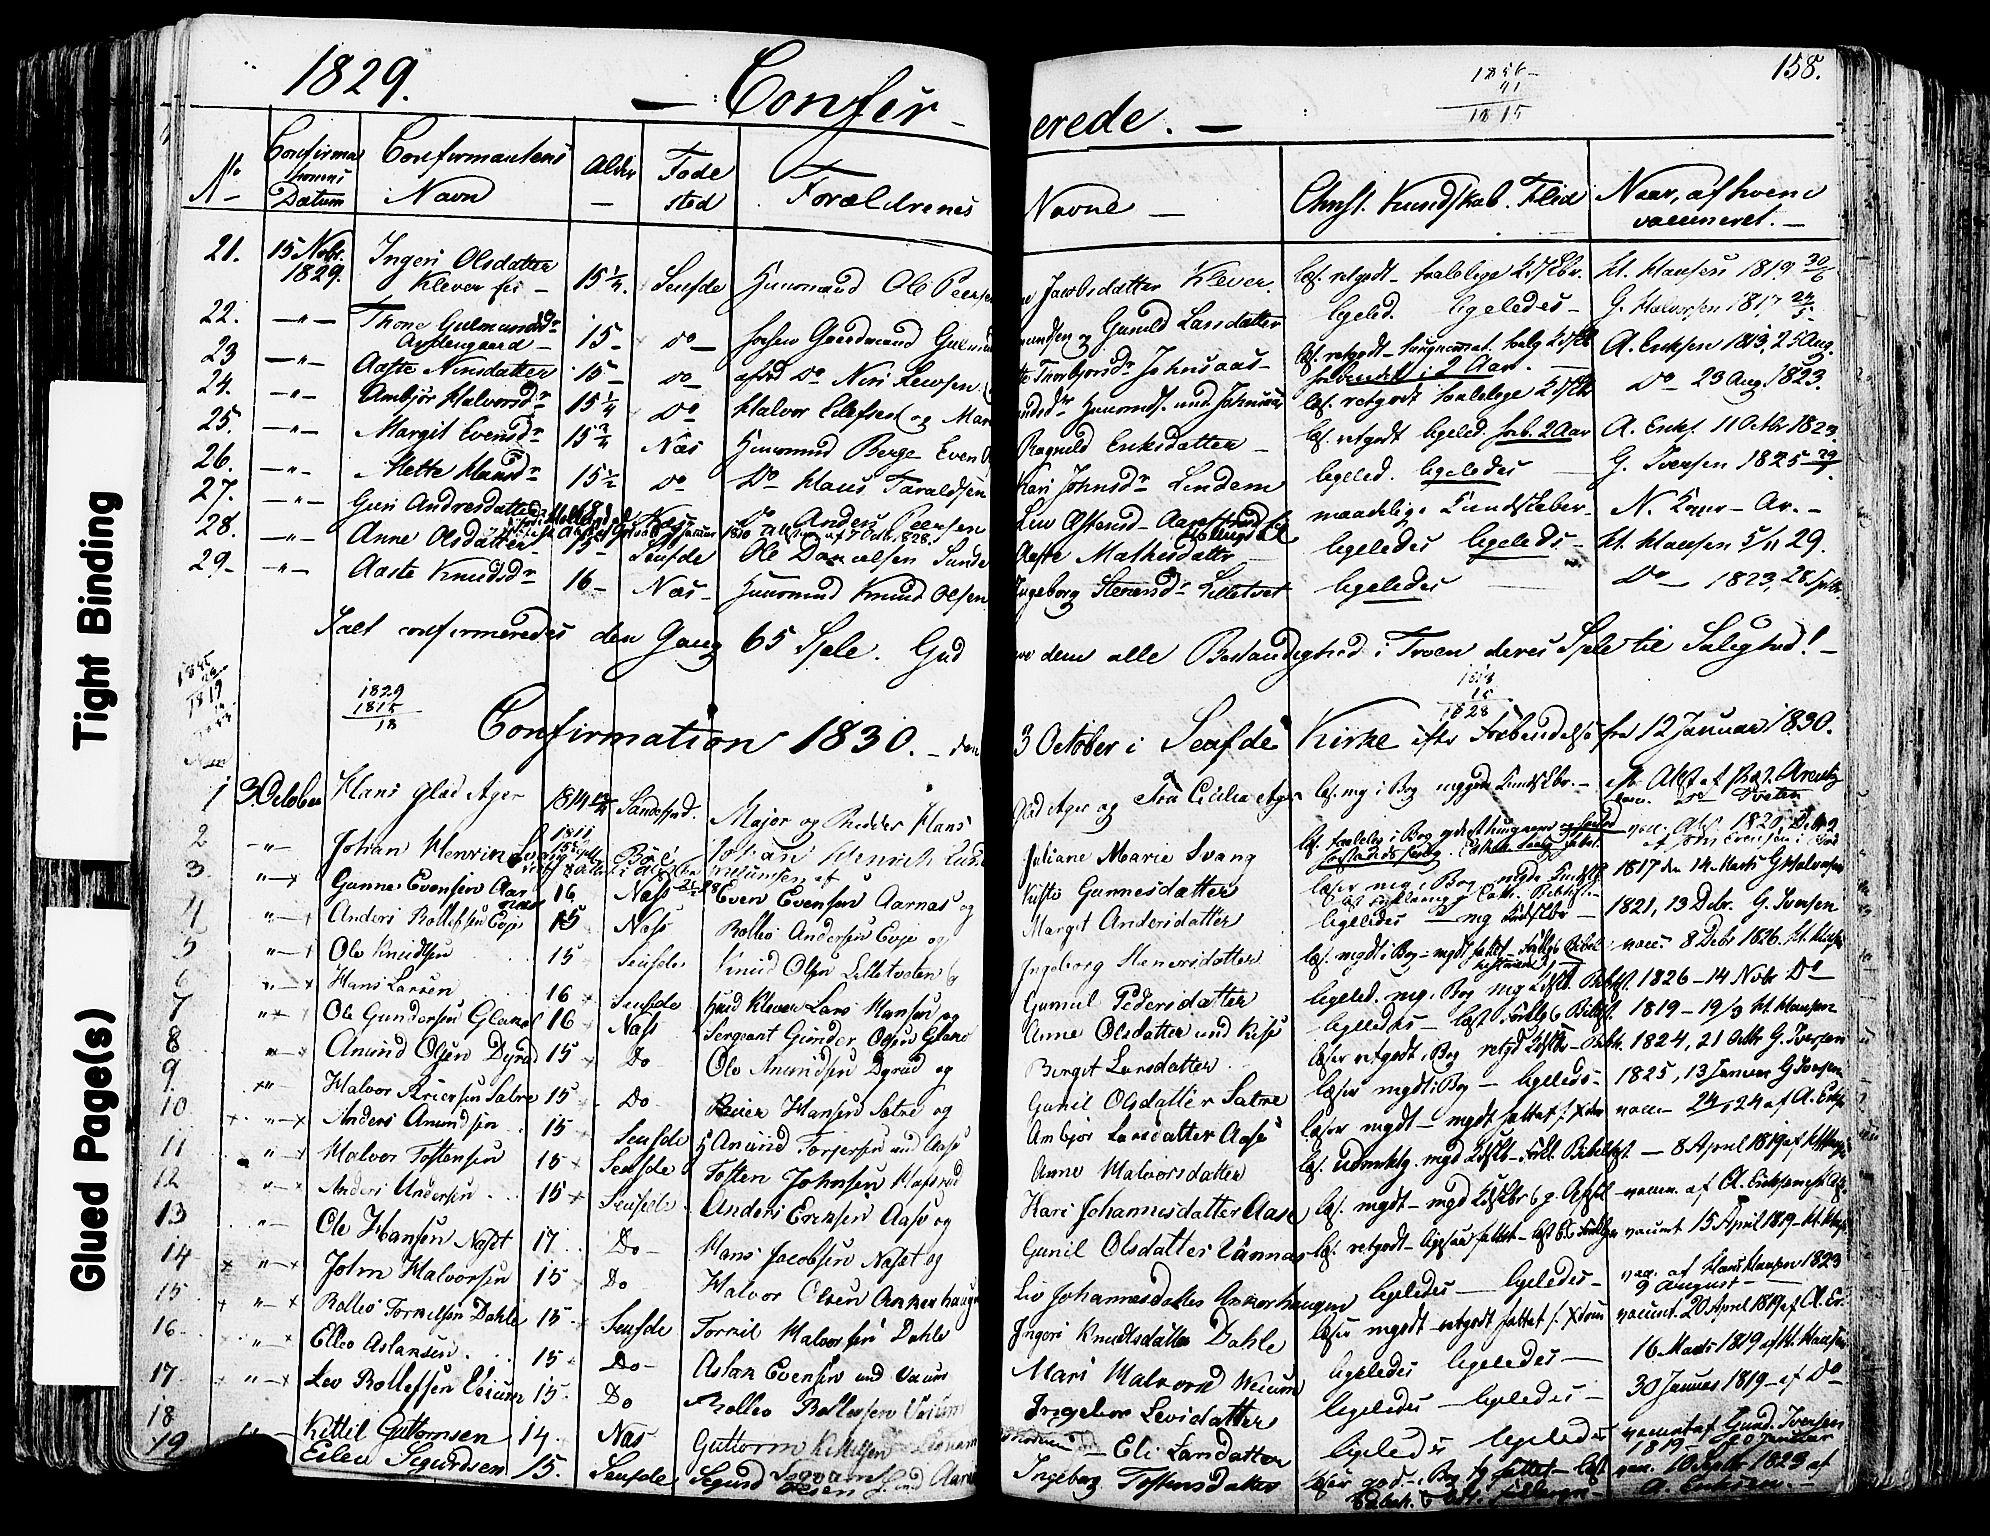 SAKO, Sauherad kirkebøker, F/Fa/L0006: Ministerialbok nr. I 6, 1827-1850, s. 158